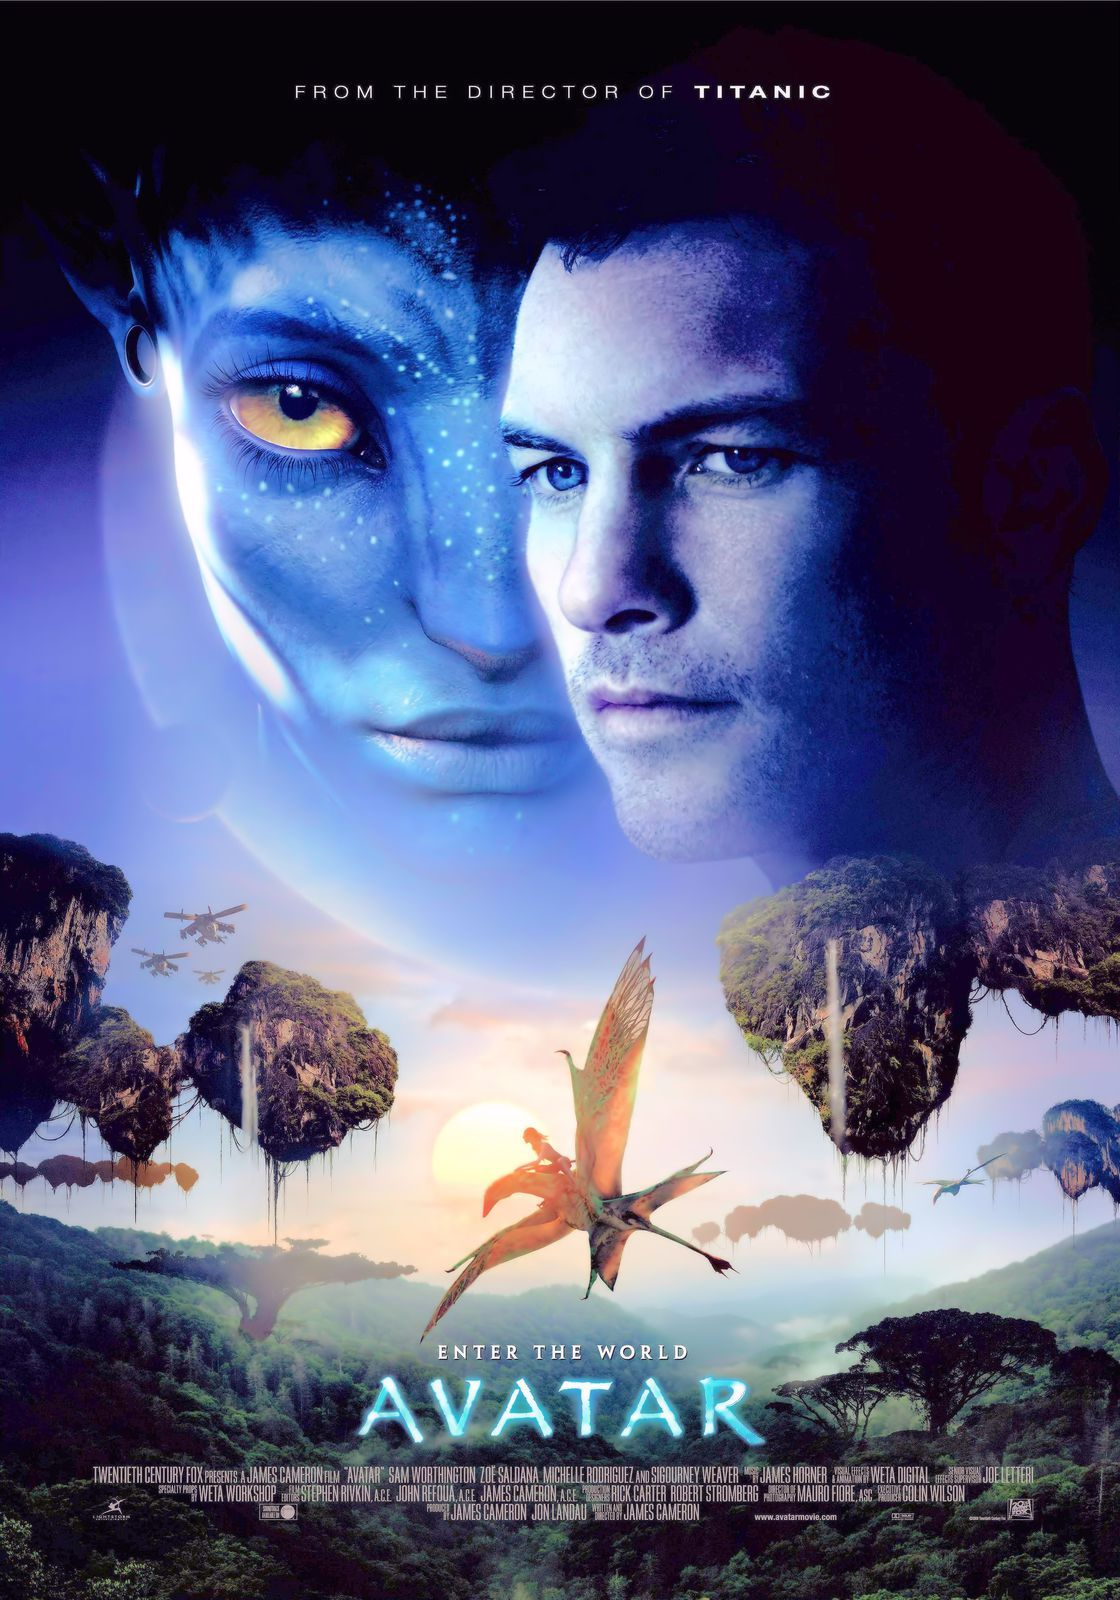 Avatar 2009 001 27 x 40 movie poster on premium photo